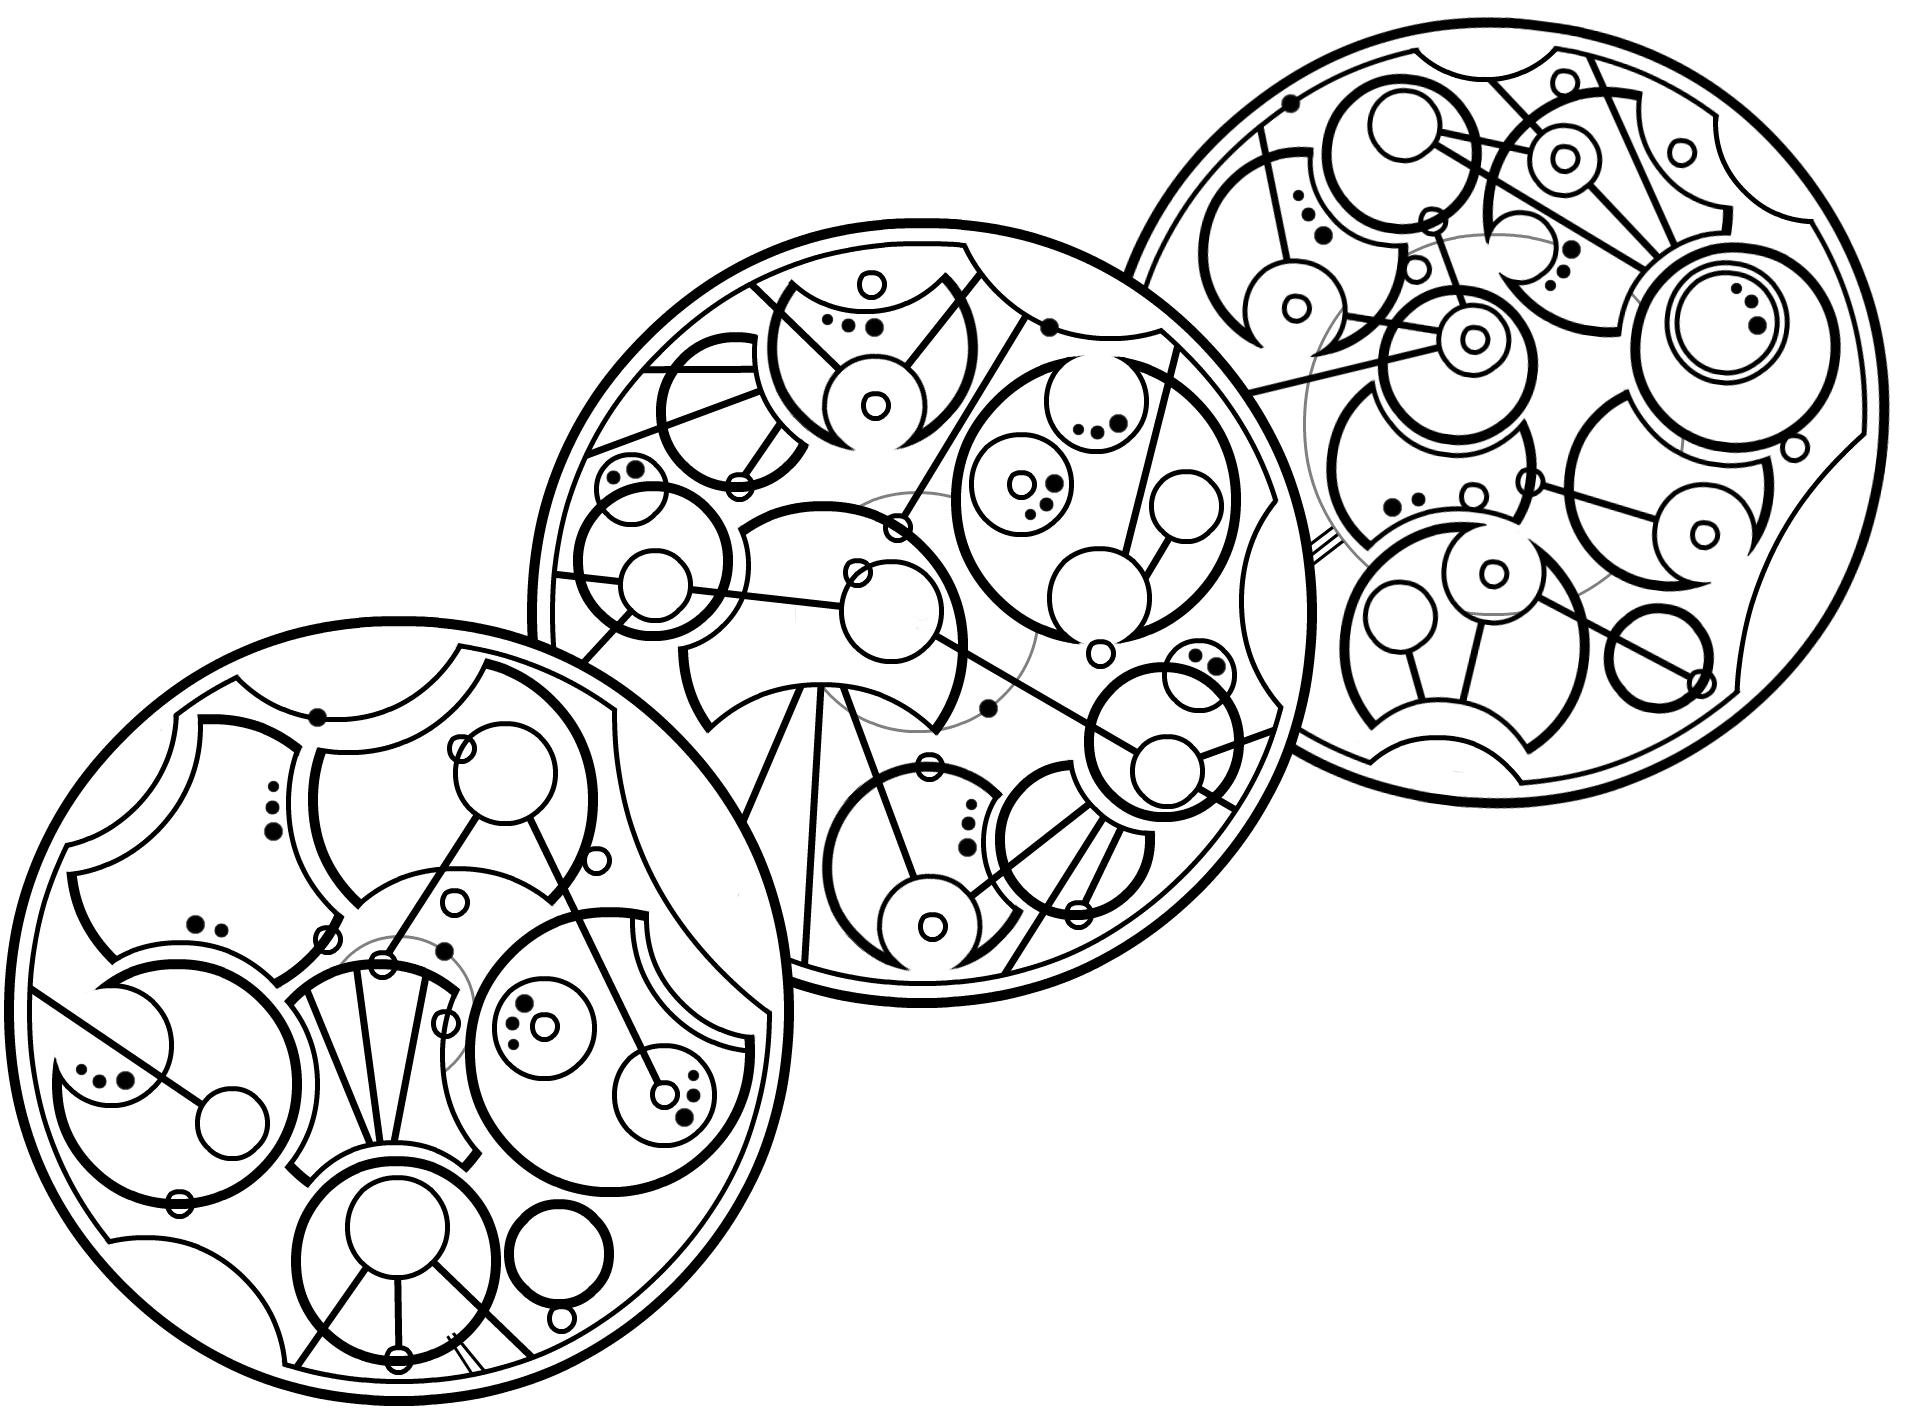 Gallifreyan 009a - WIP, Teapot, Lines 1-3 (adjust) by ThorUF72